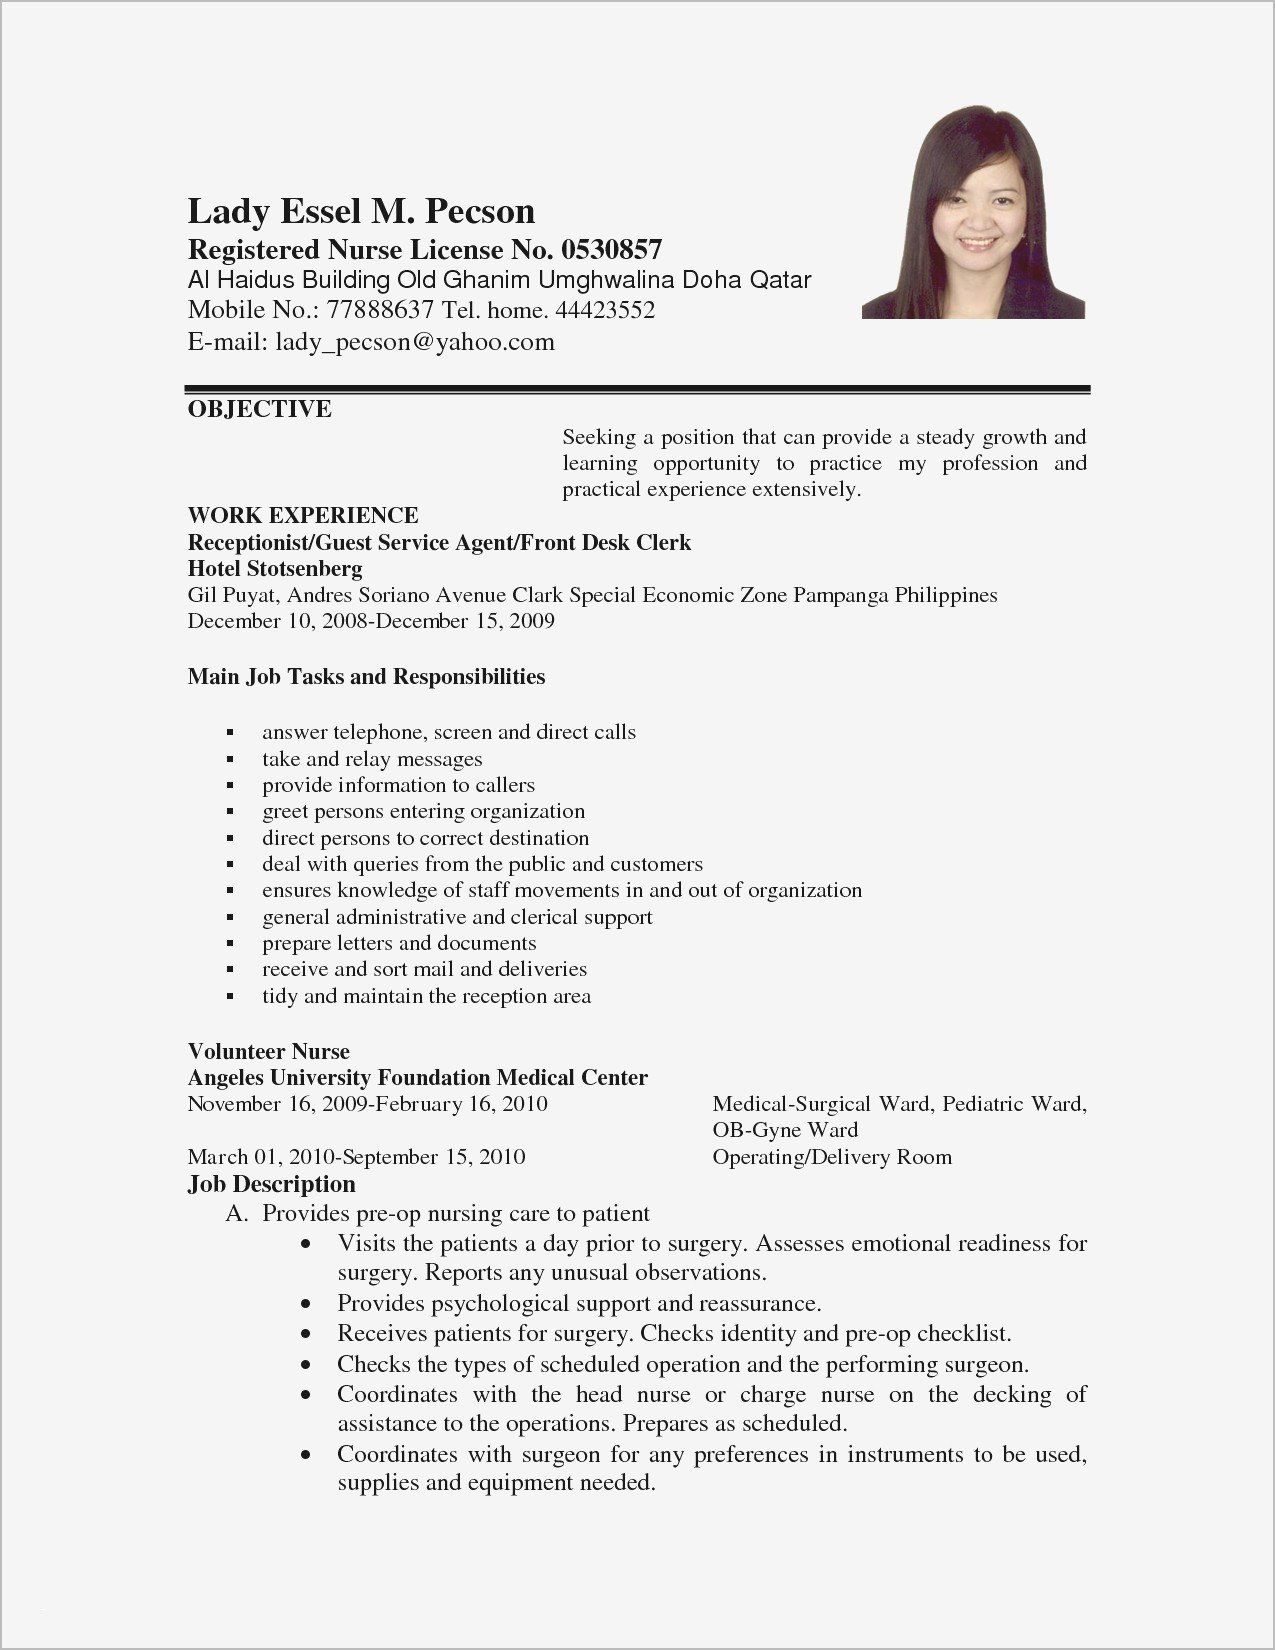 Bartender Resume No Experience New Bartender Job Description For Resume Best Bartender Re Job Resume Examples Cover Letter For Resume Resume Objective Examples